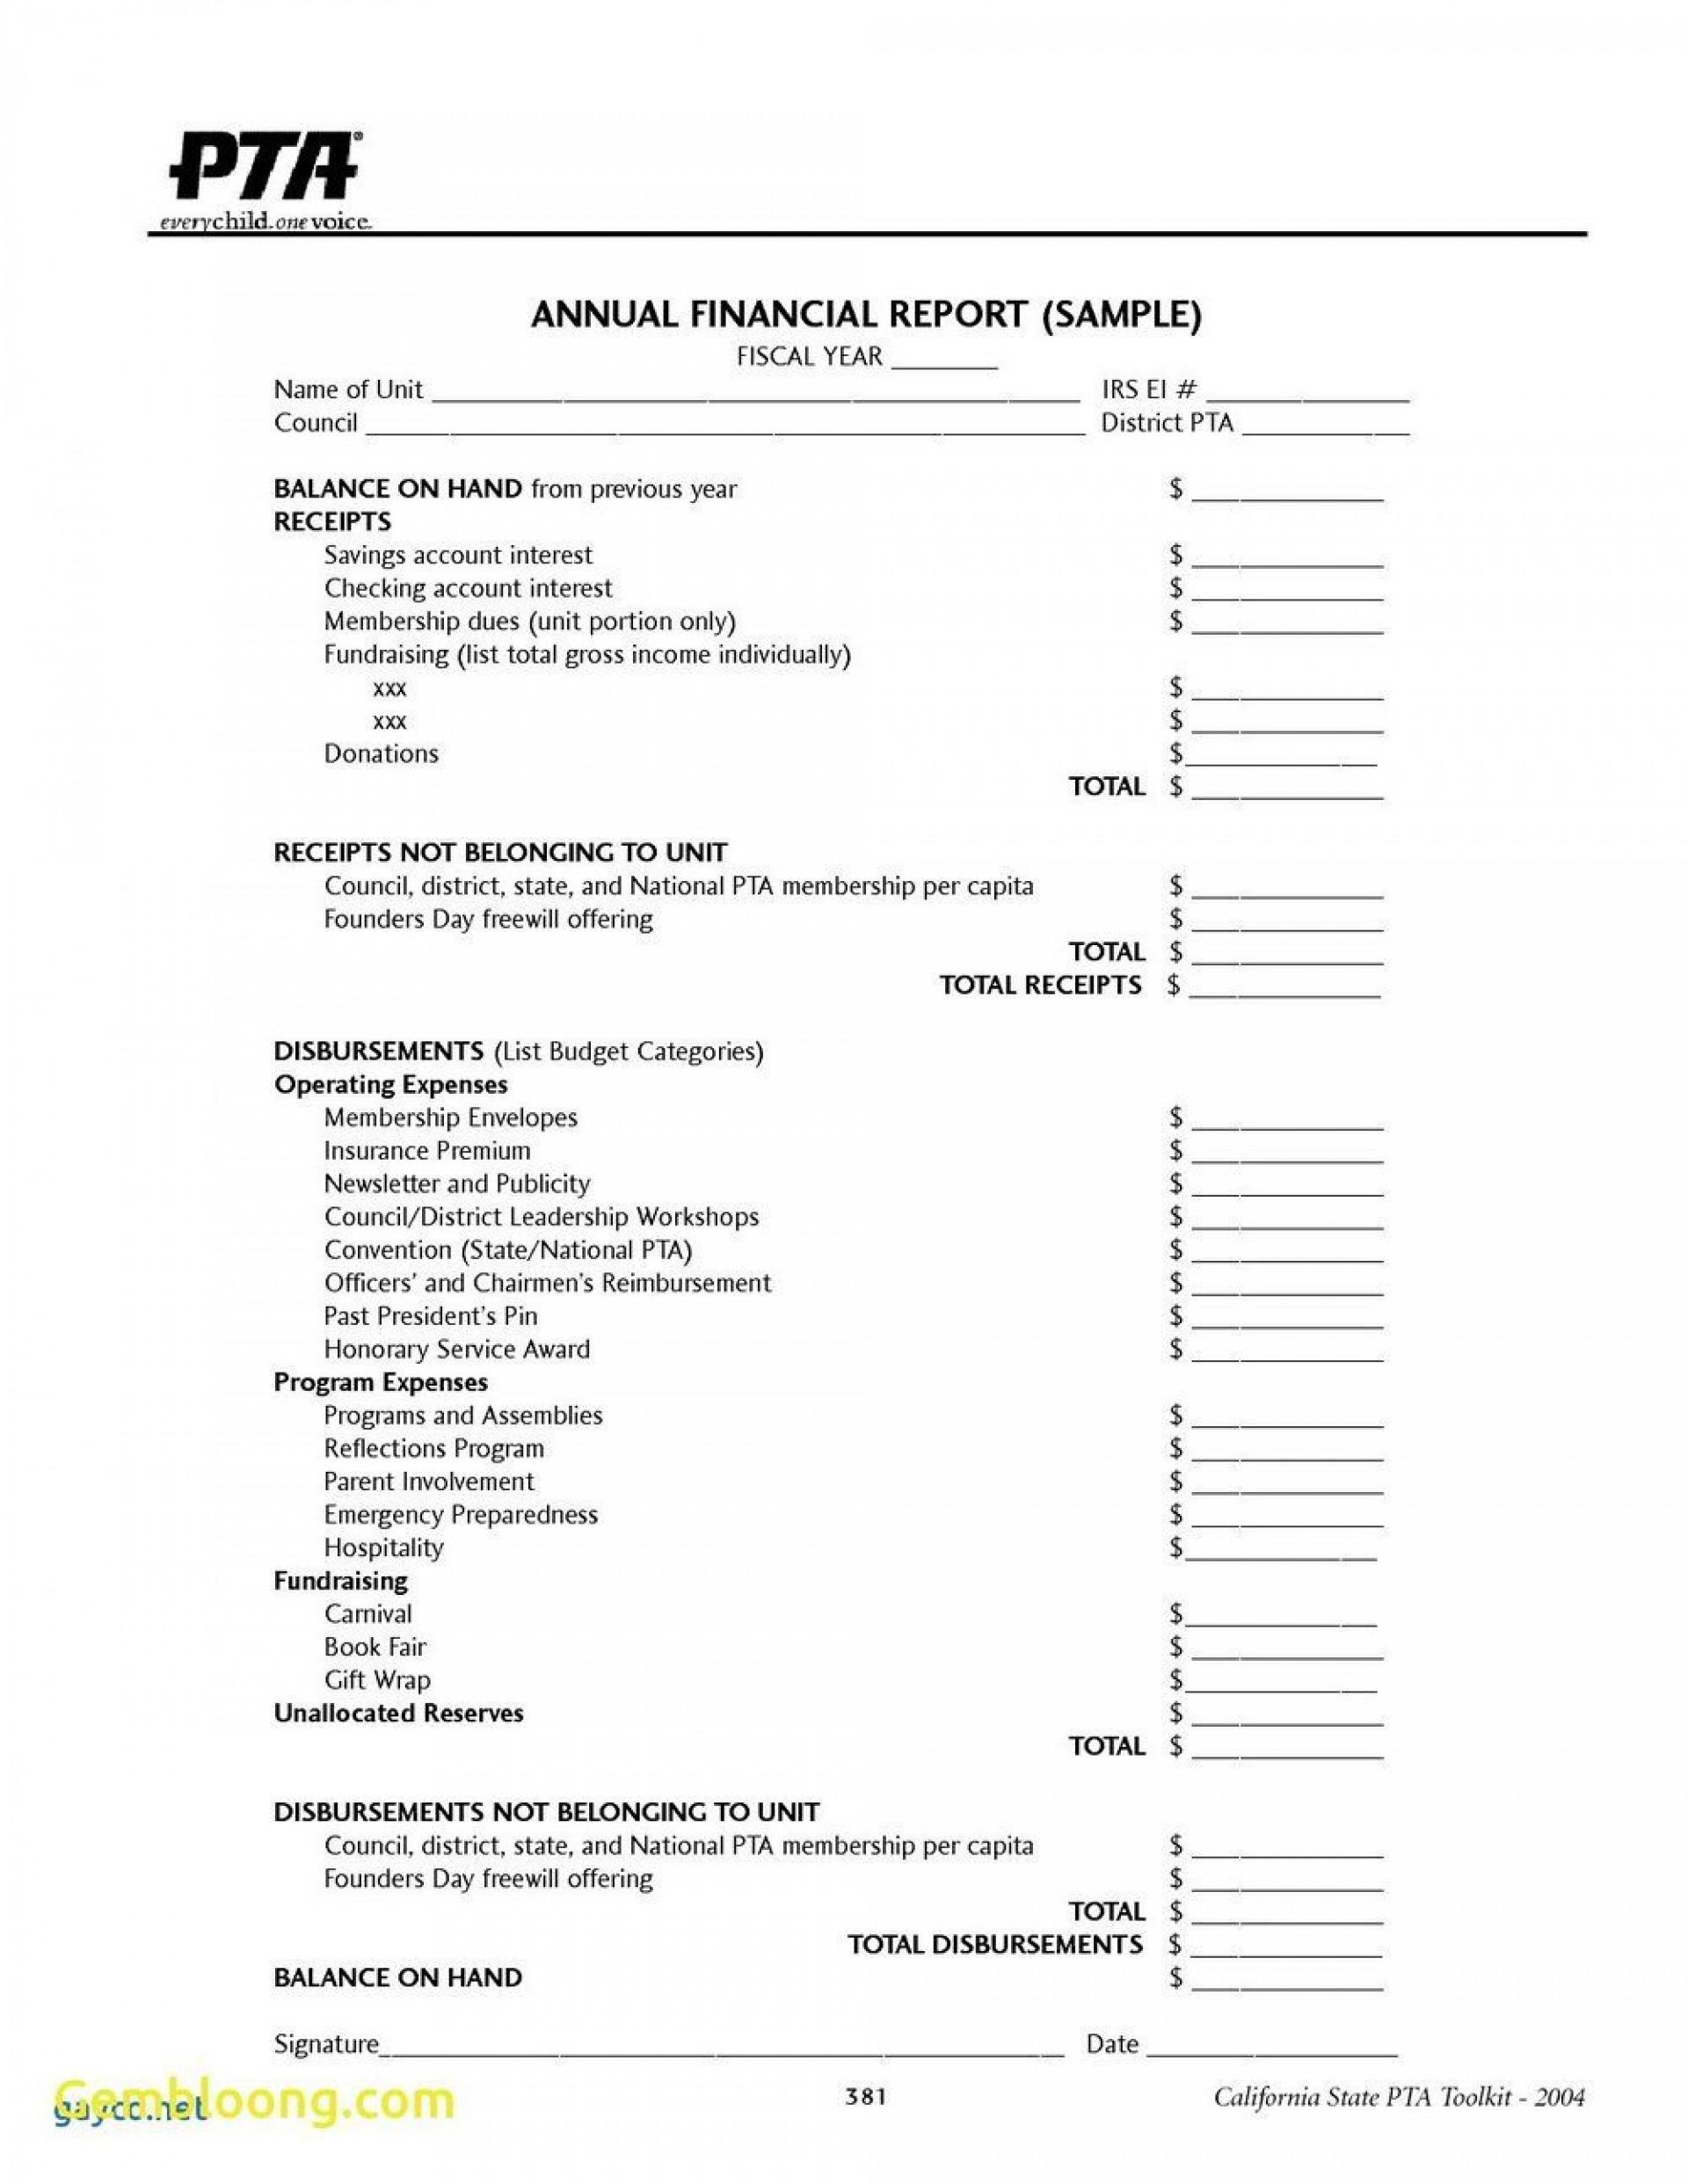 004 Singular Treasurer Report Template Non Profit Design  Treasurer' Word Free For Nonprofit Organization1920